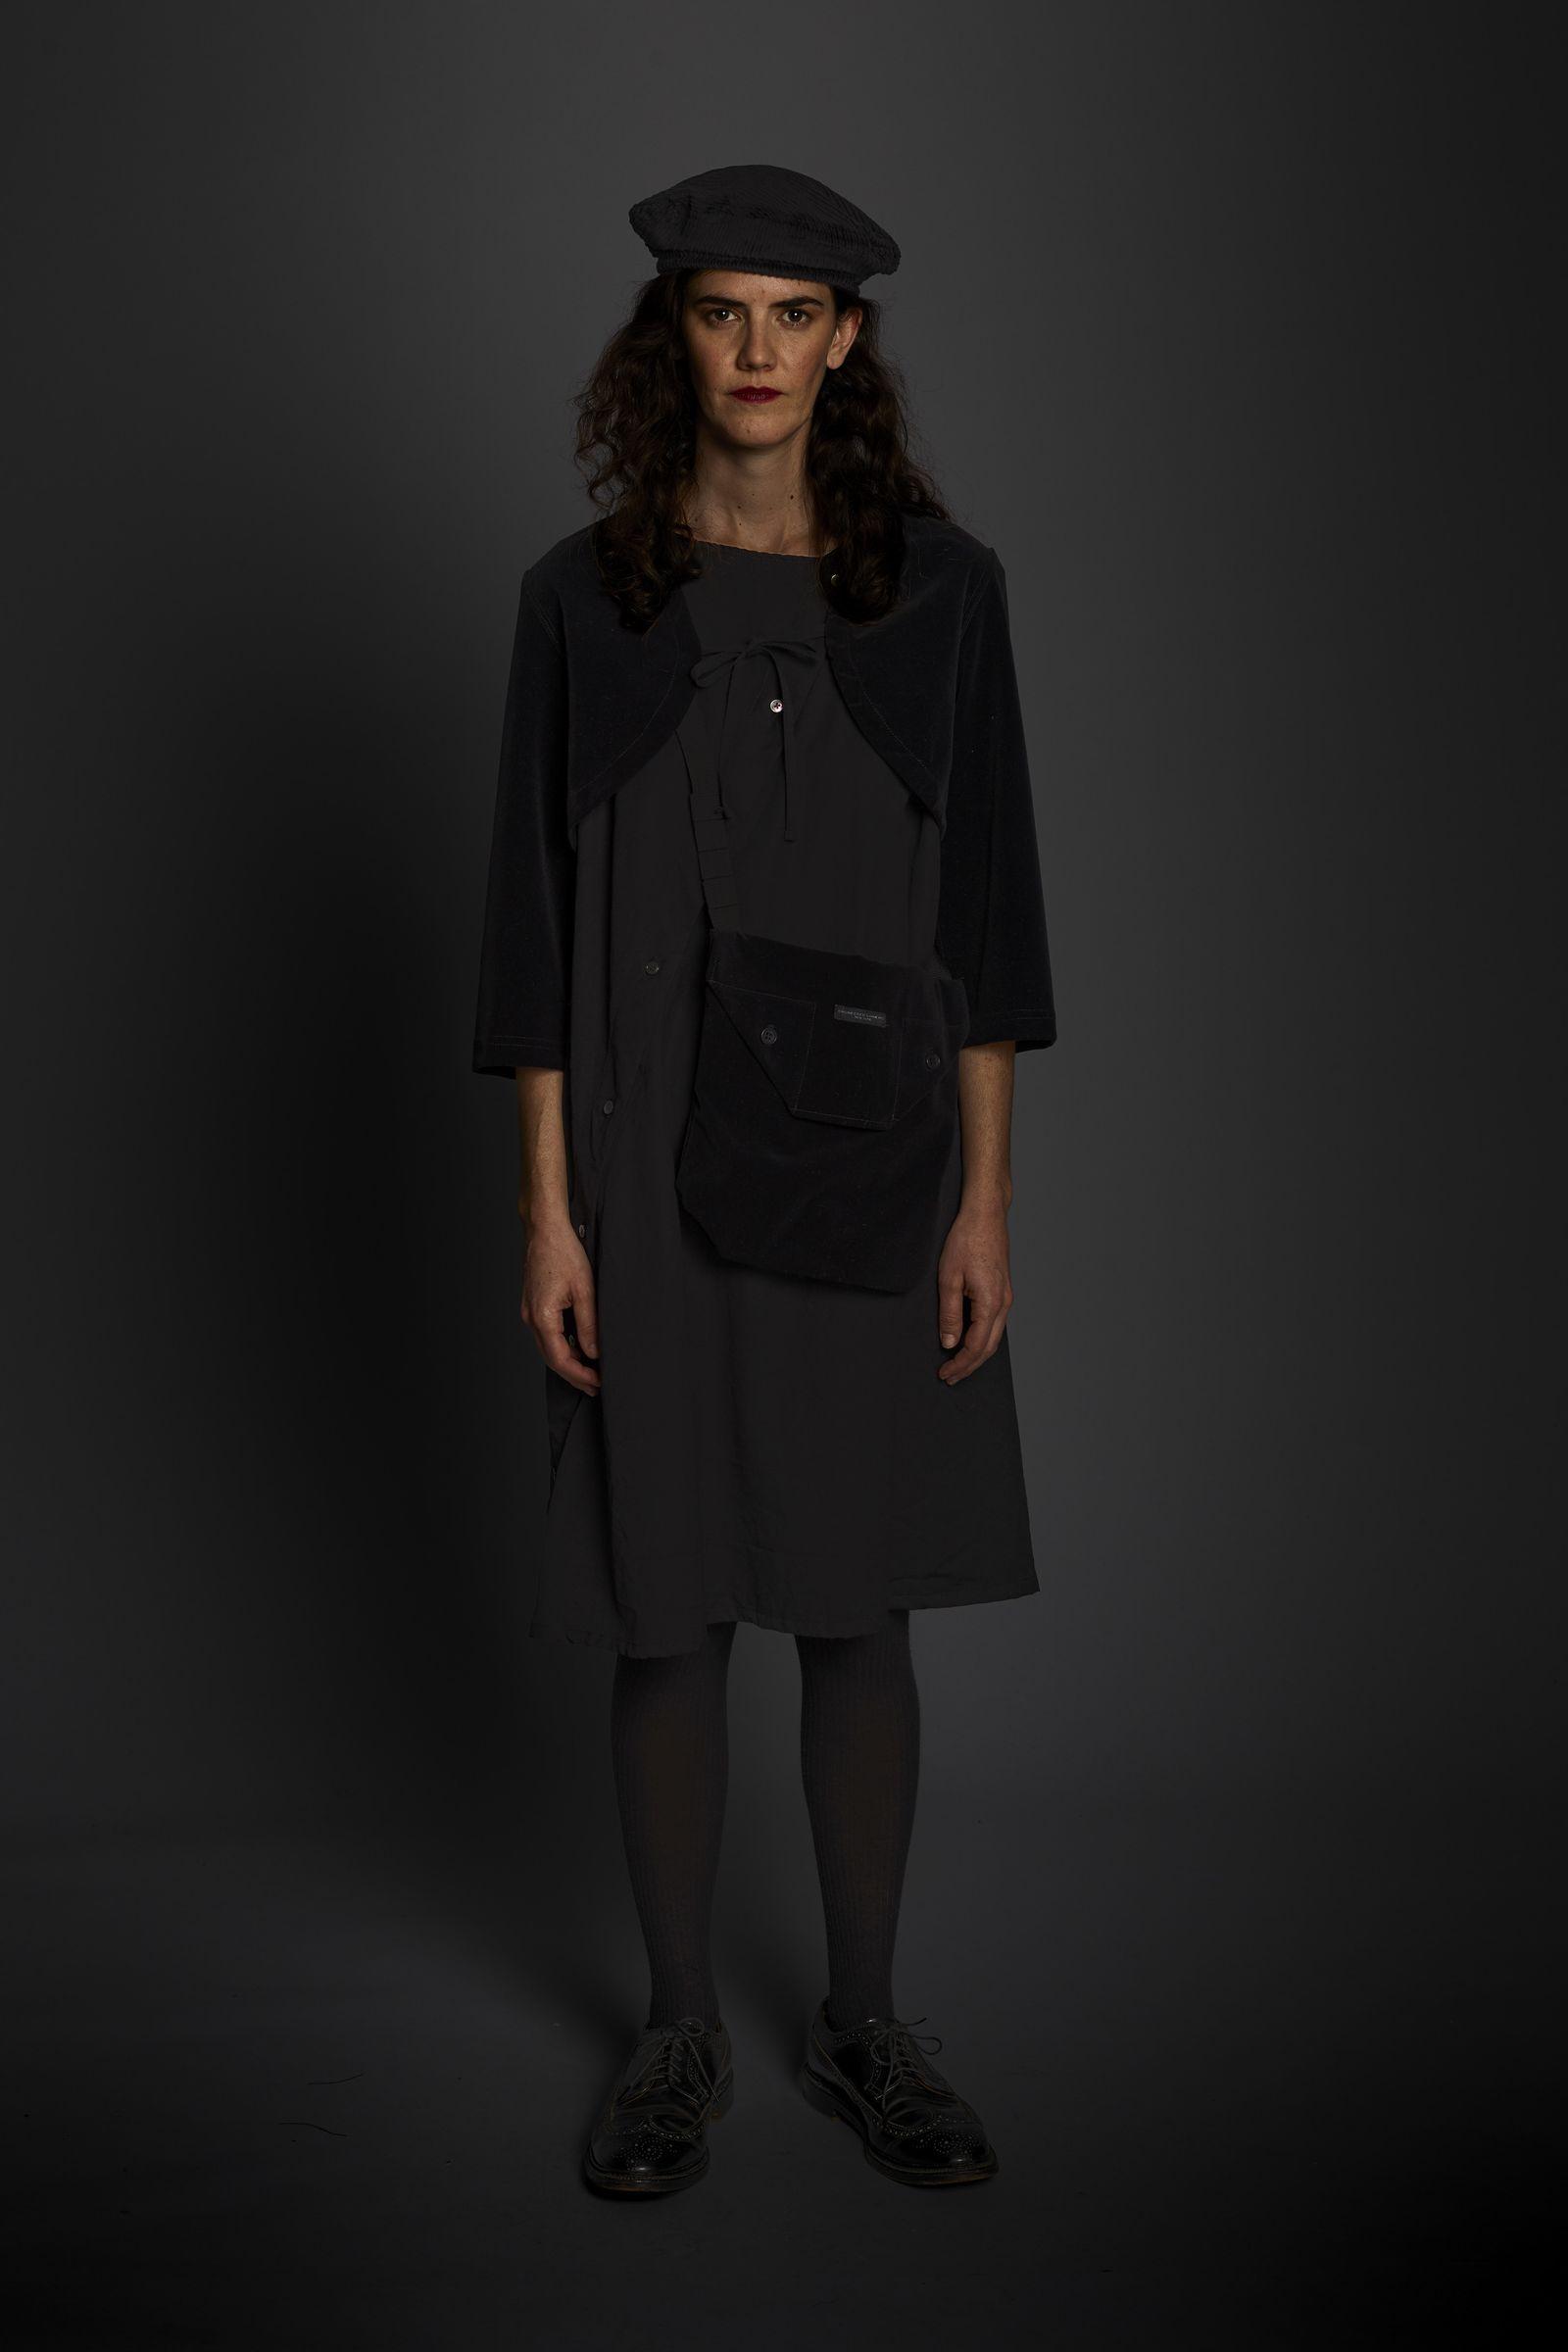 engineered-garments-fall-winter-2020-42